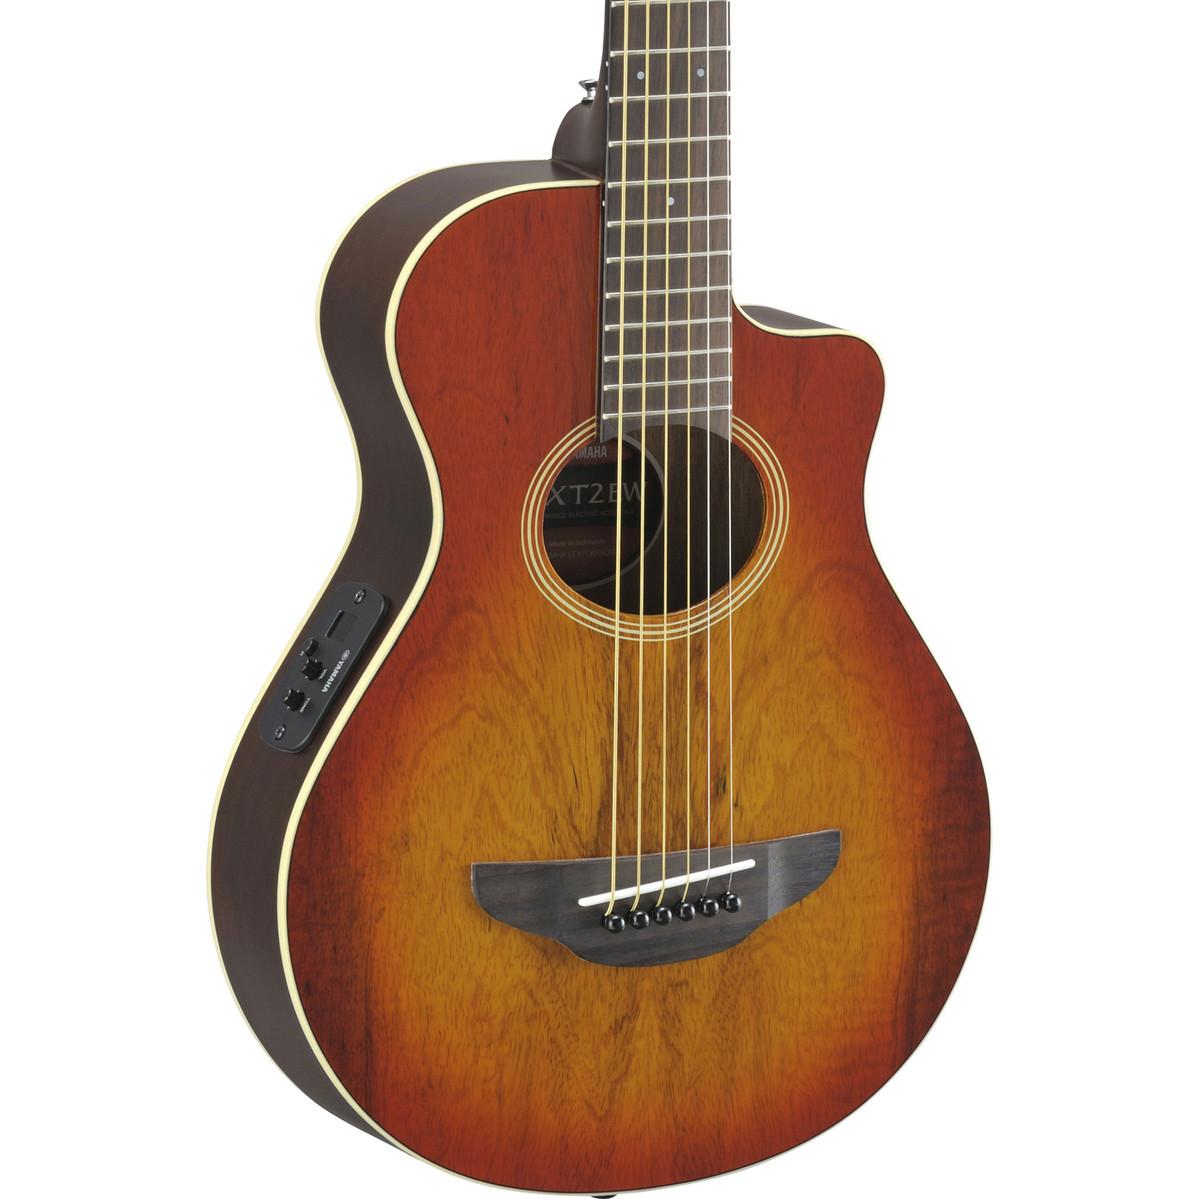 disc yamaha apxt2ew 3 4 guitare electro acoustique lumi re amber burst. Black Bedroom Furniture Sets. Home Design Ideas